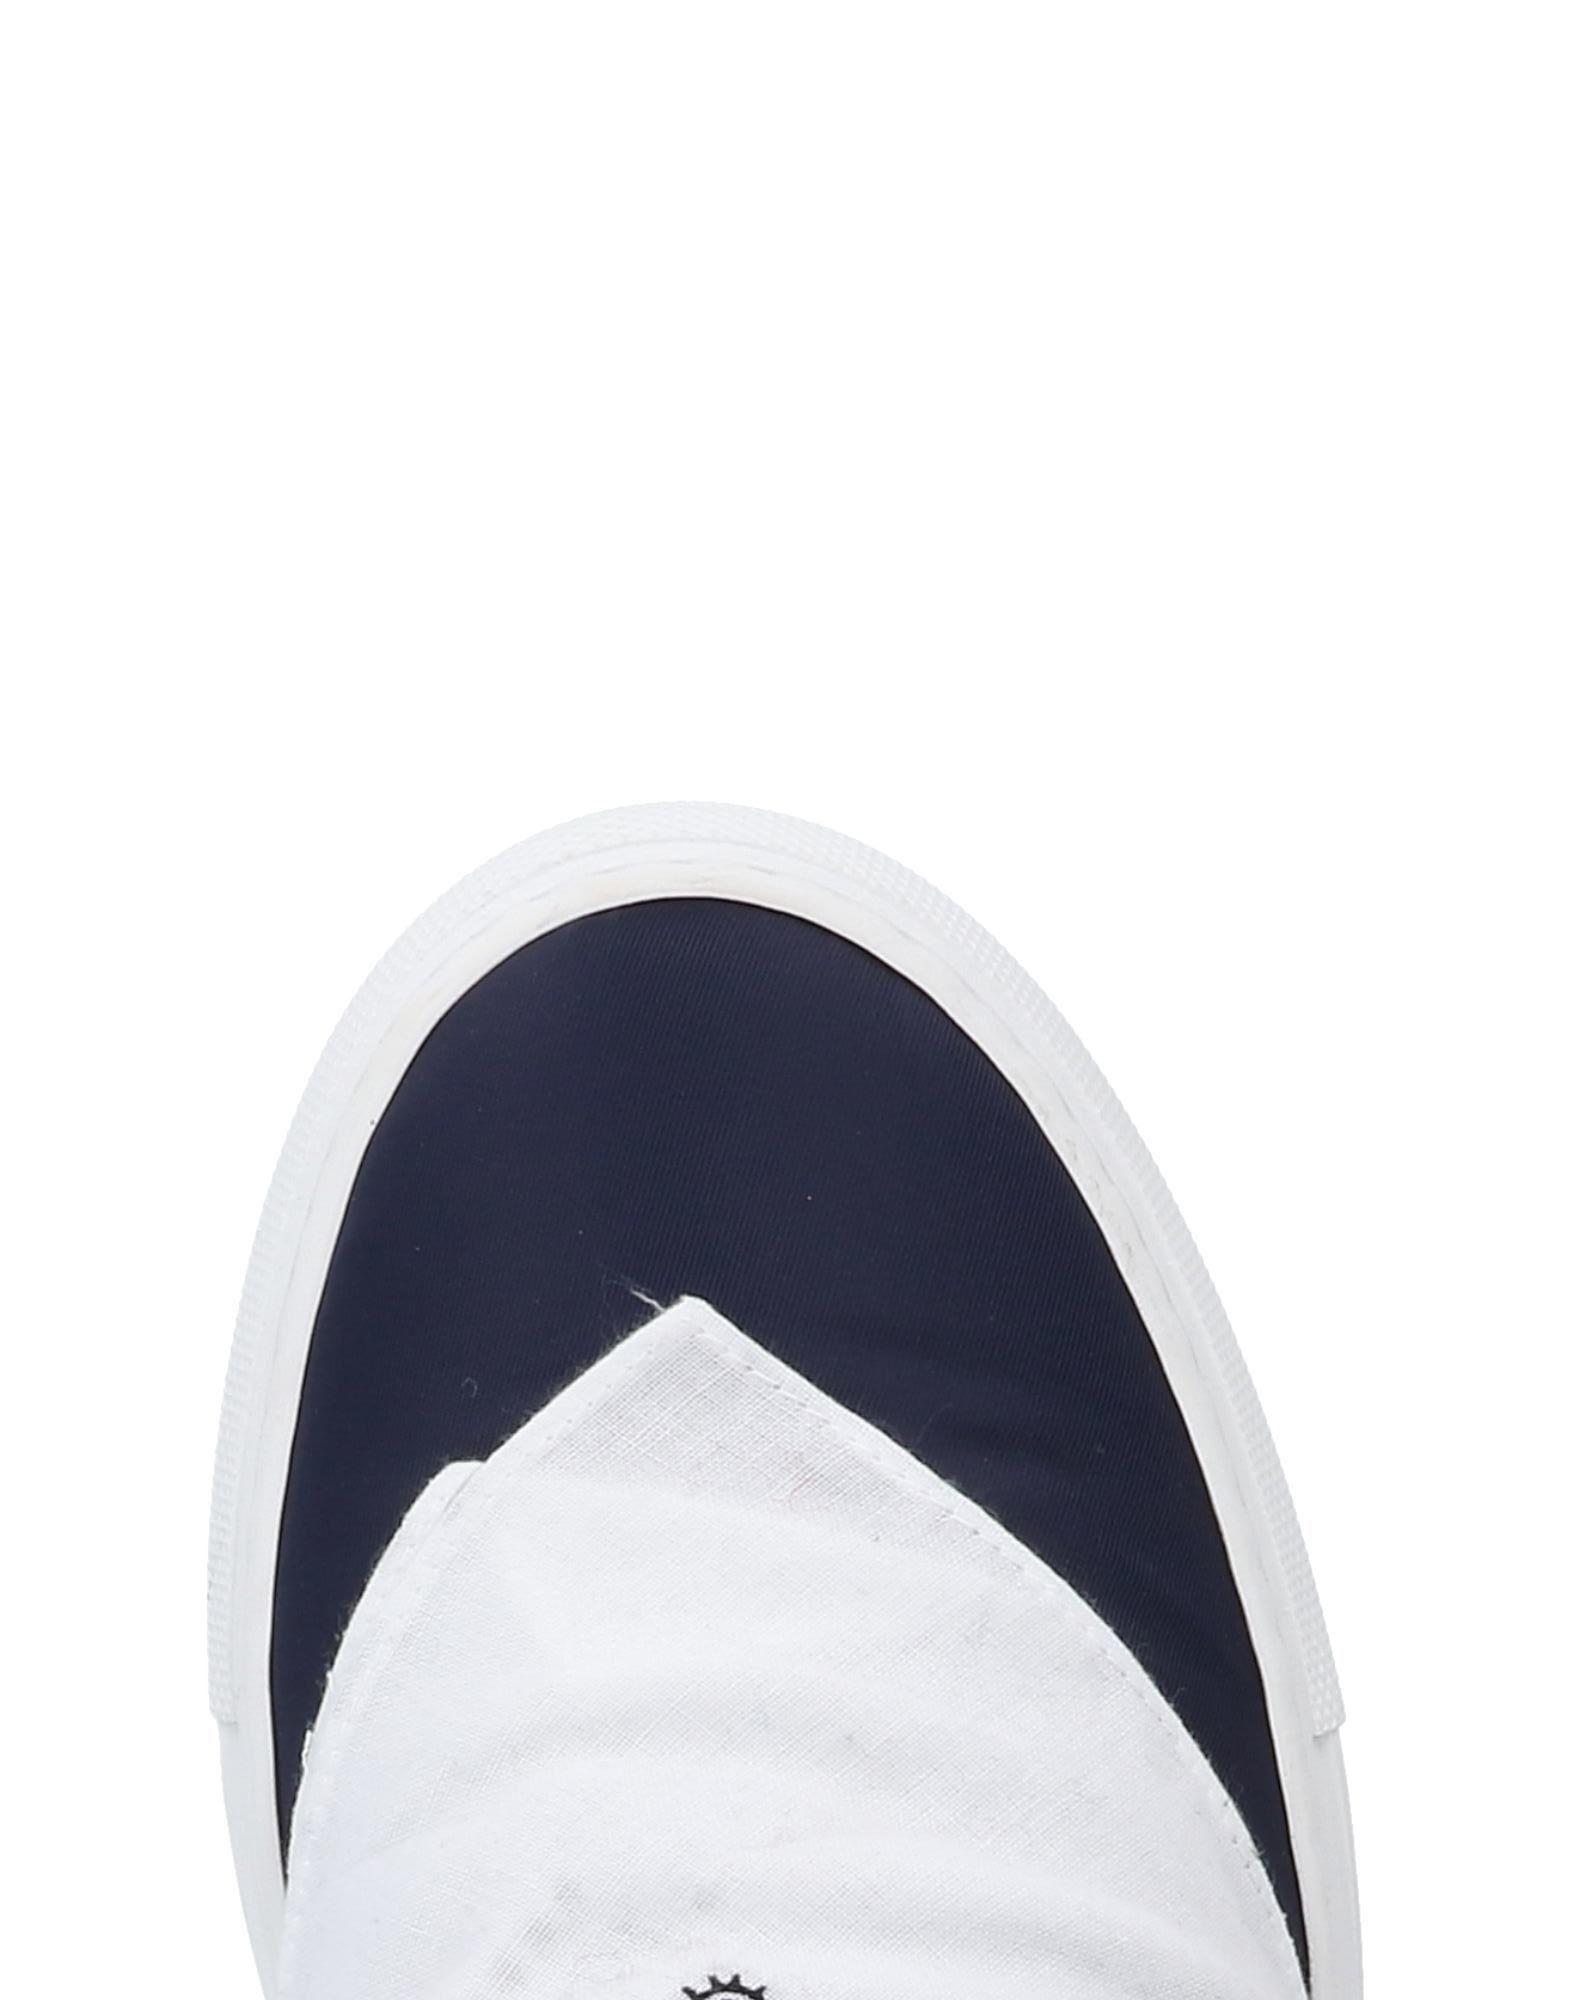 Joshua*S Sneakers Sneakers Sneakers - Women Joshua*S Sneakers online on  Canada - 11482545XI eaaae9